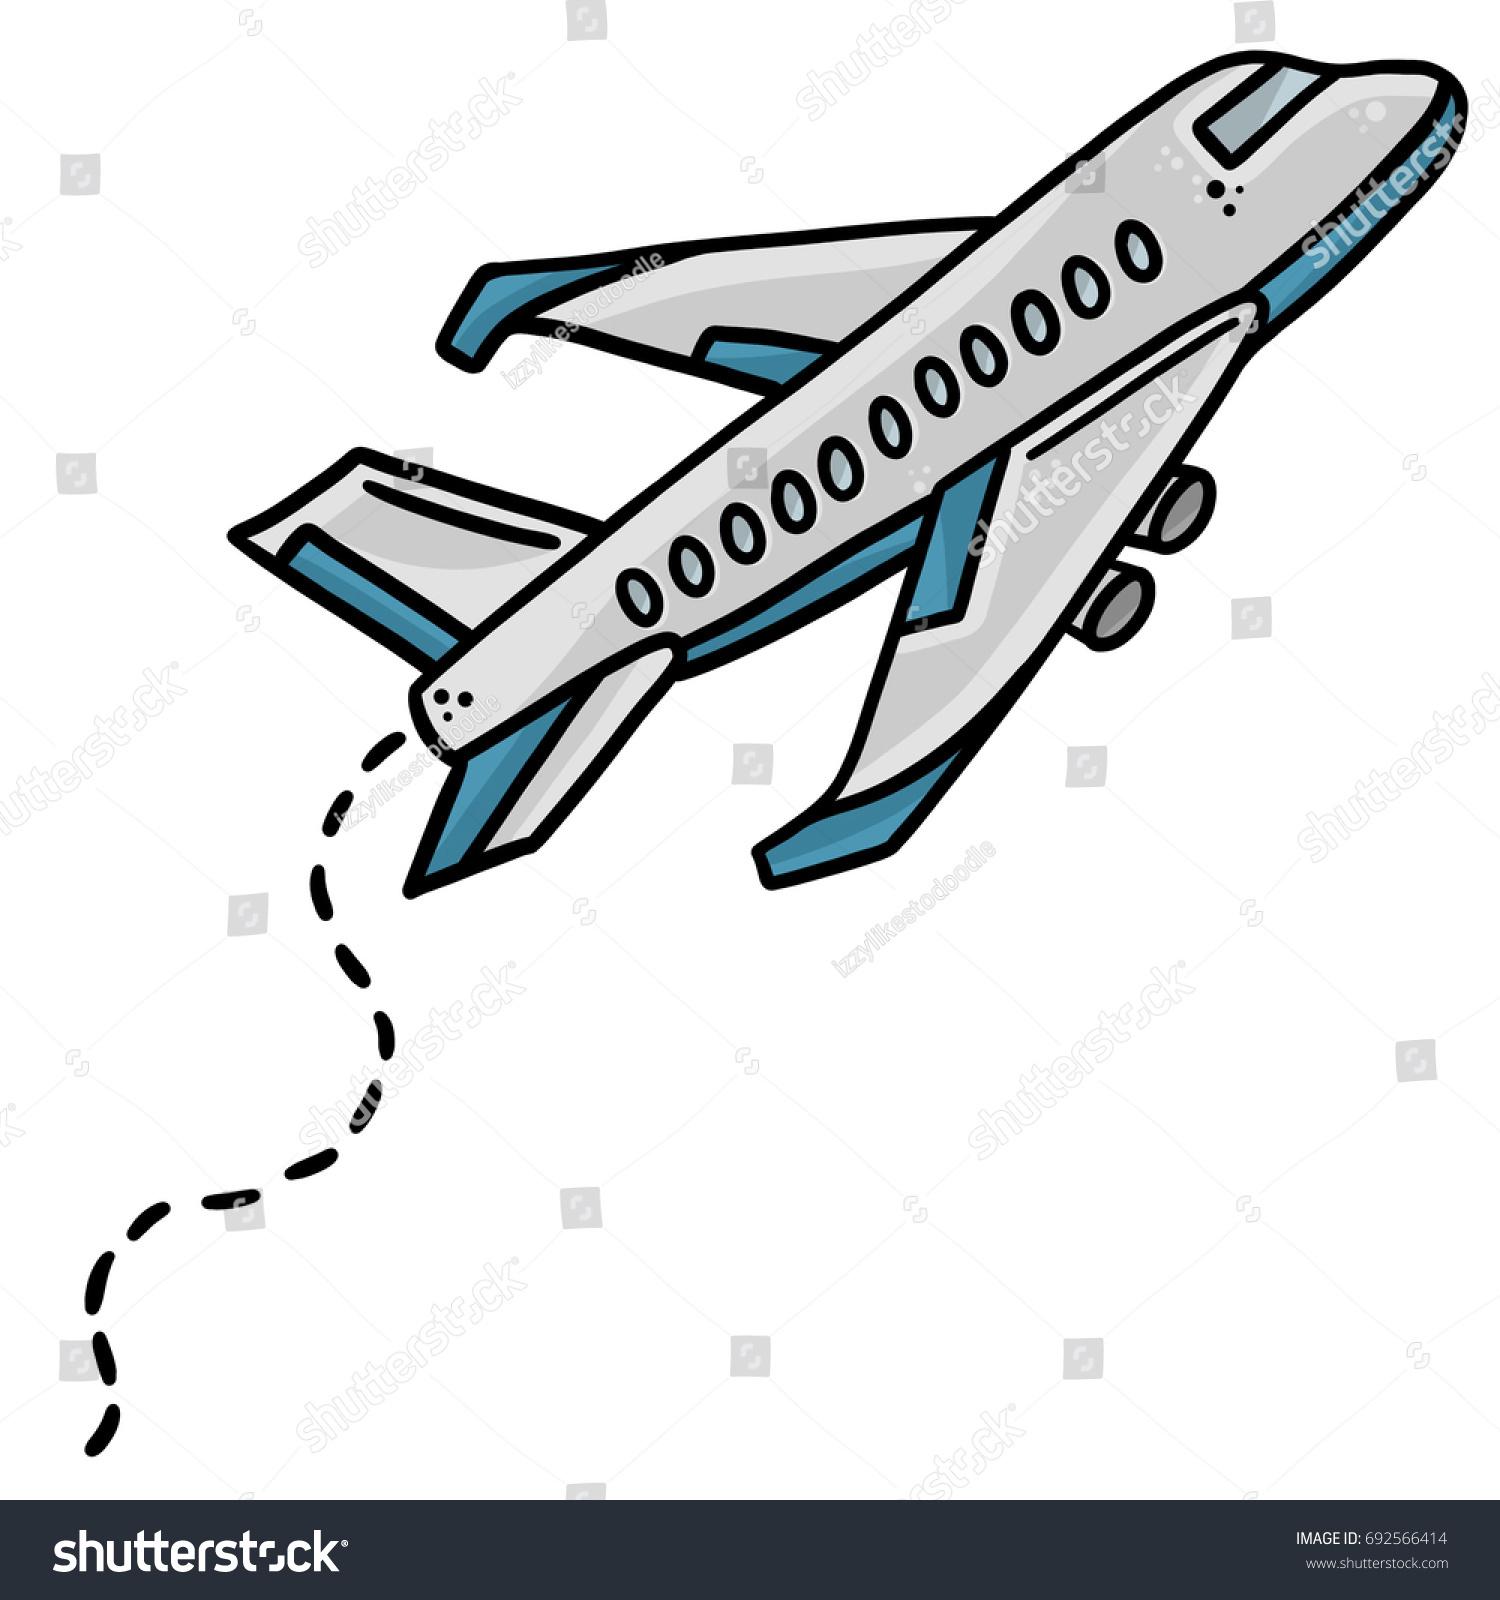 airplane line art vector illustration clip stock photo photo rh shutterstock com free aviation clipart images aviation day clipart